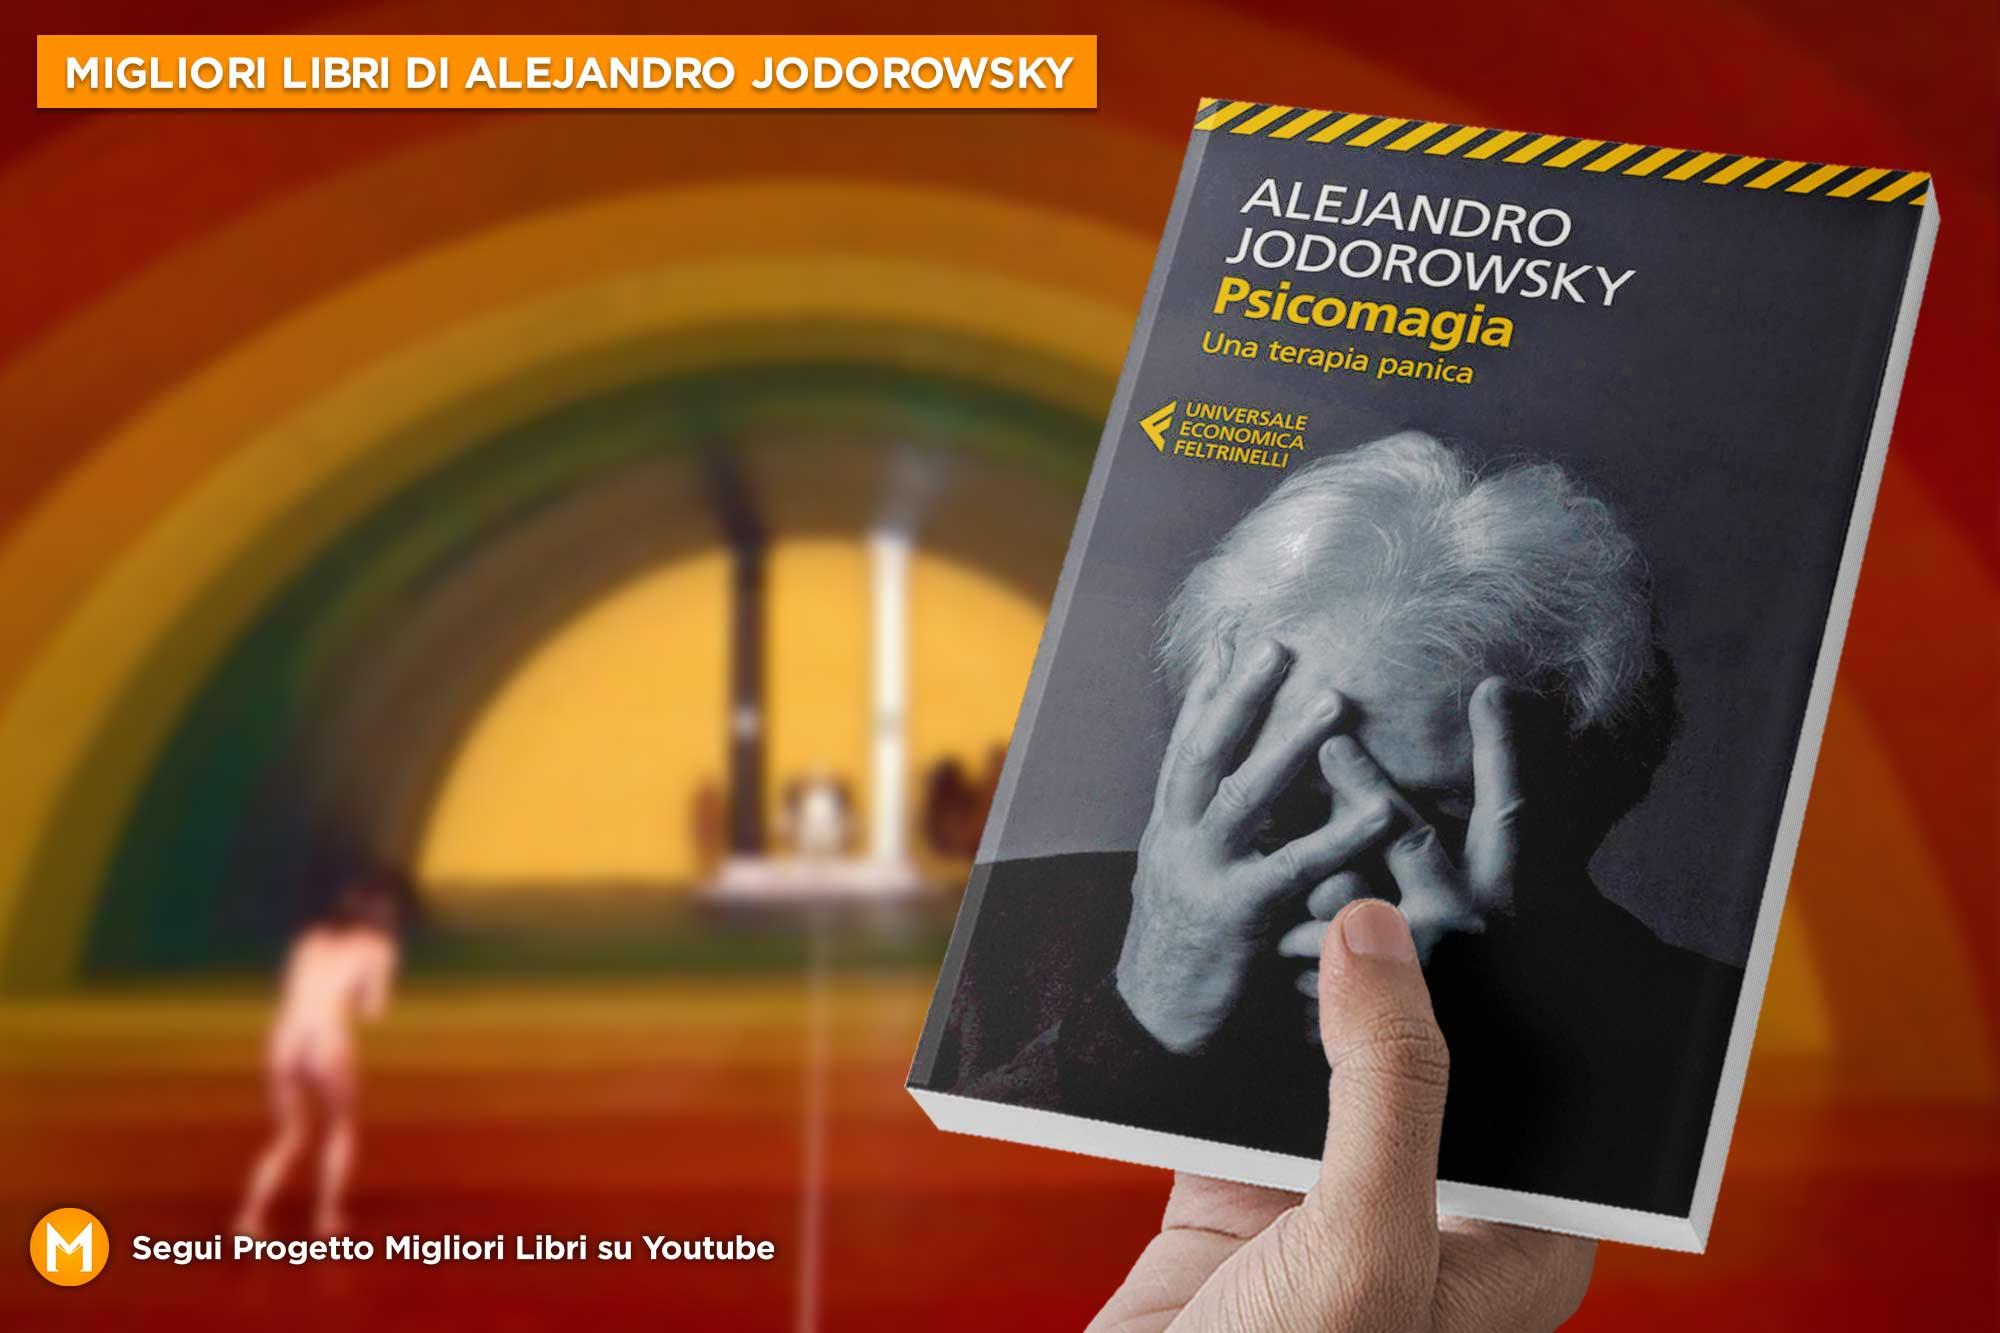 libri-alejandro-jodorowsky-psicomagia